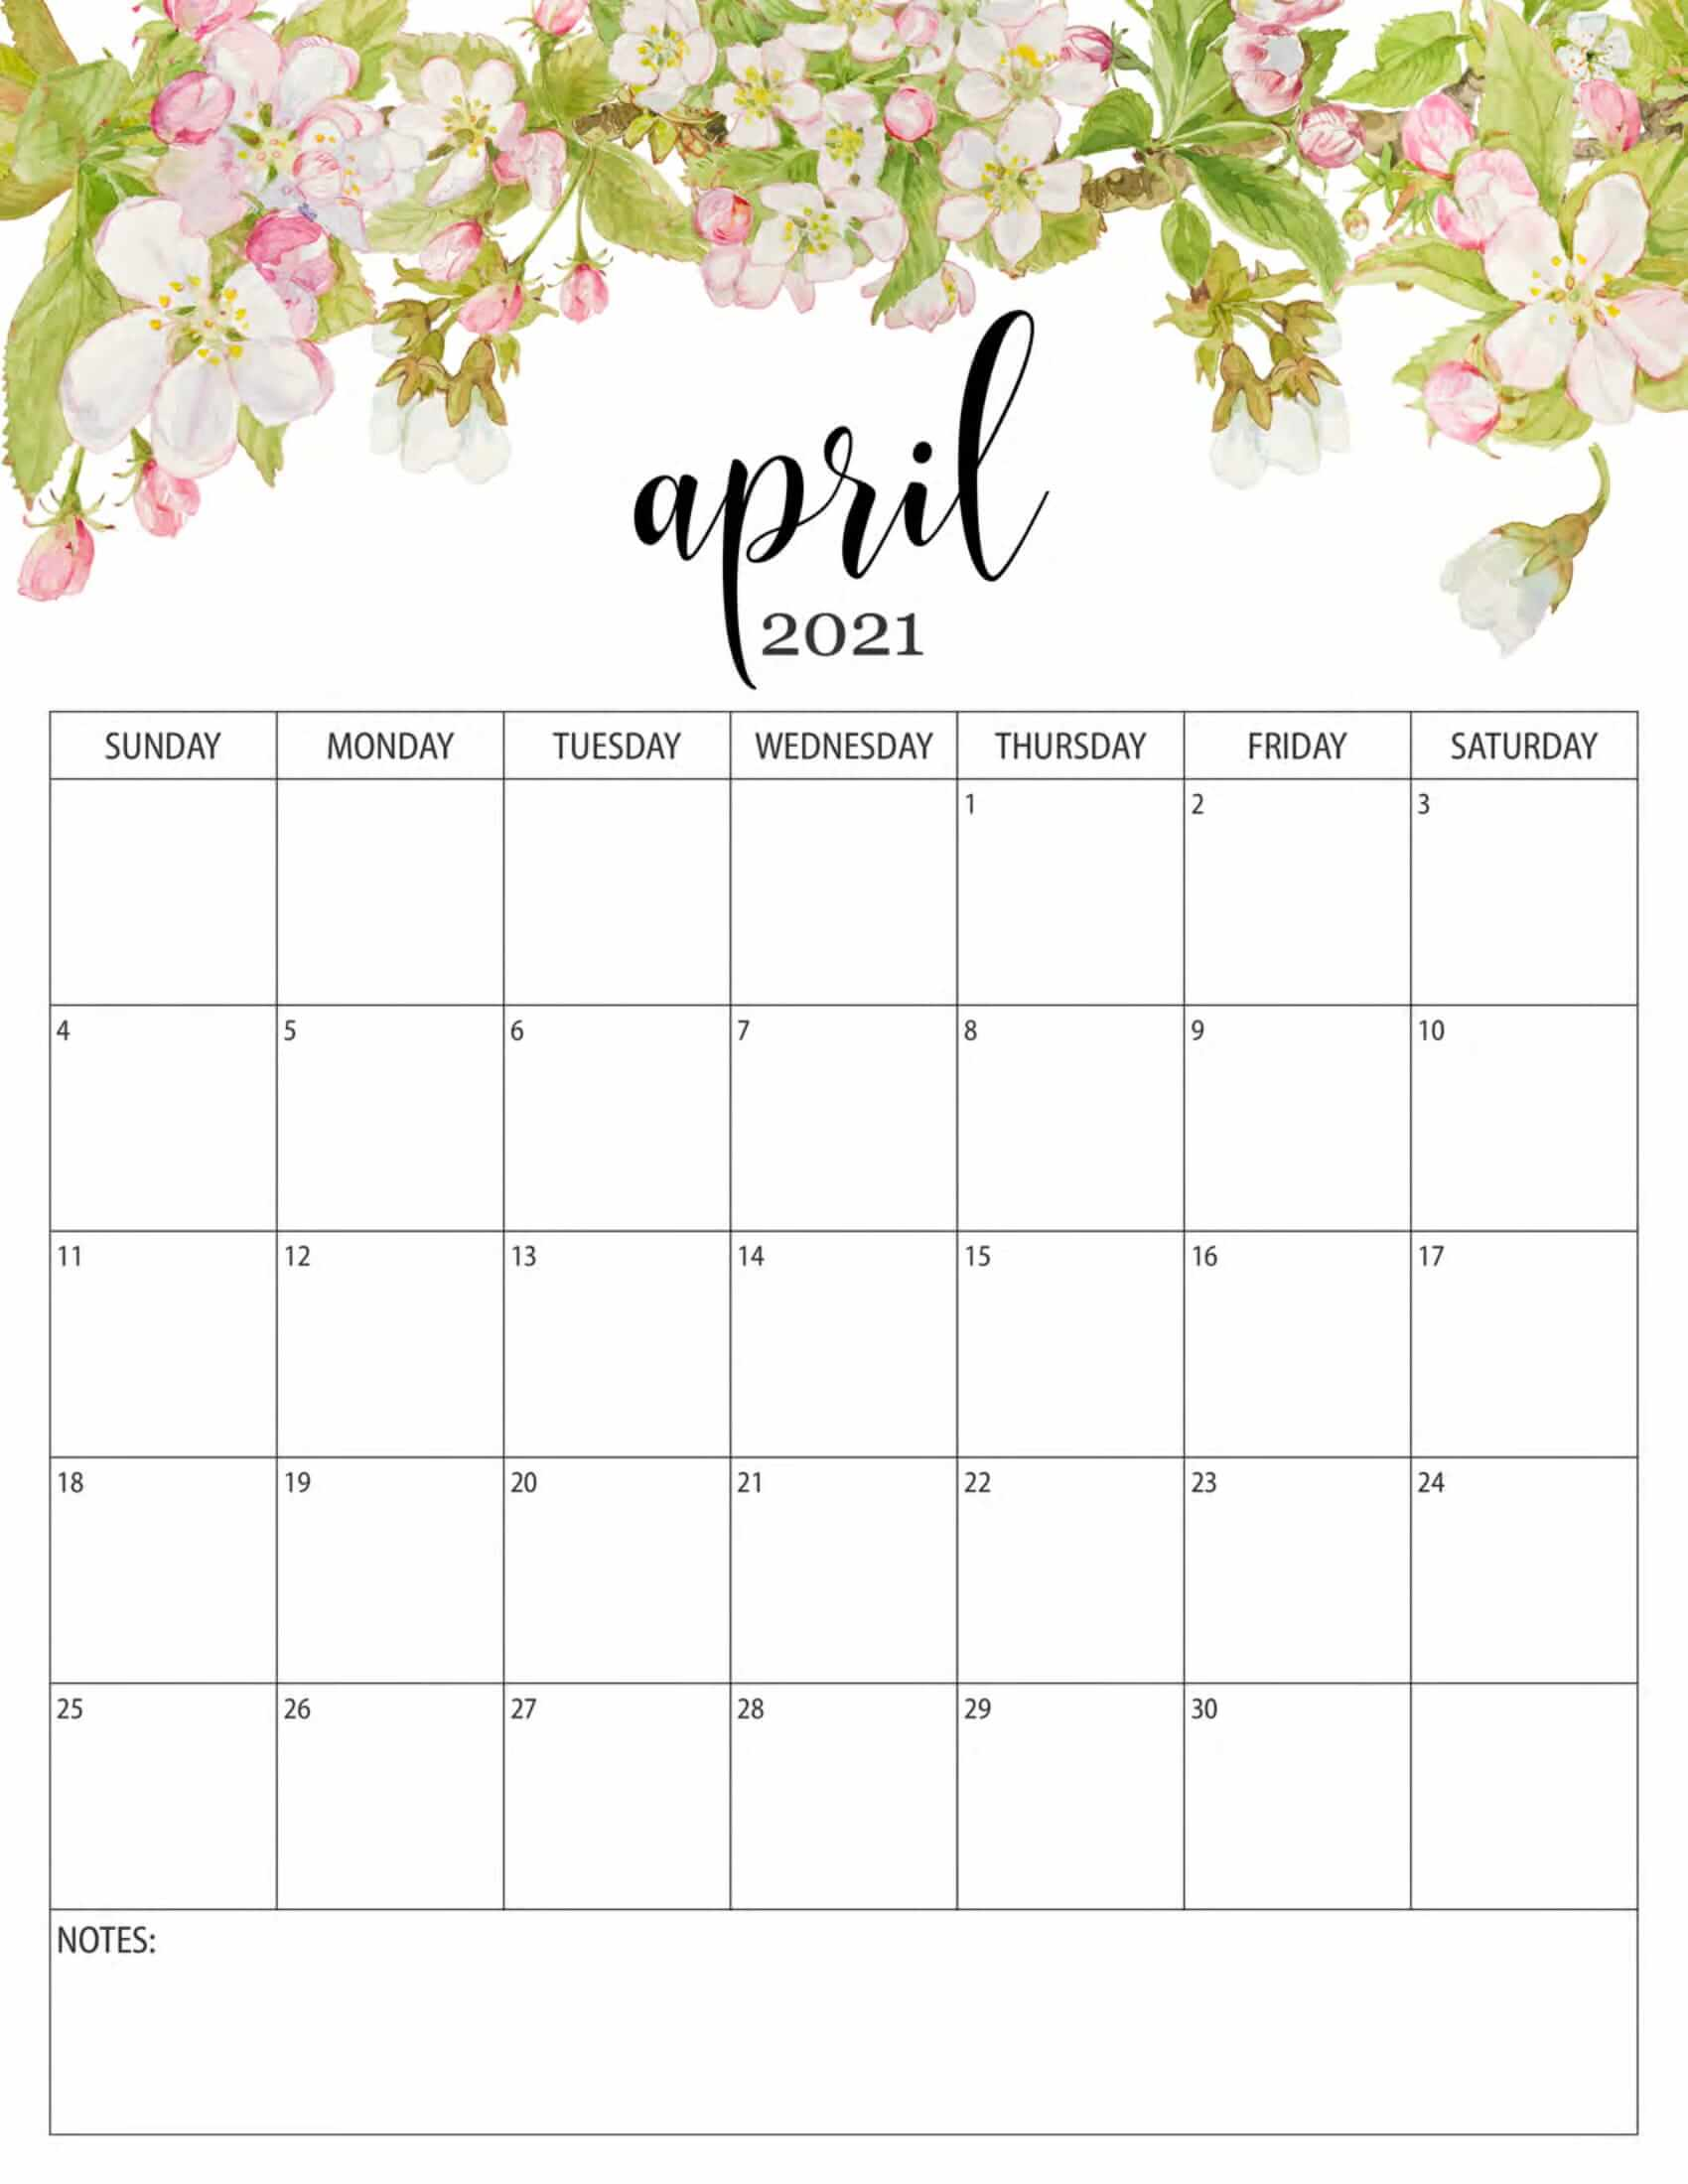 April 2021 Floral Calendar Template